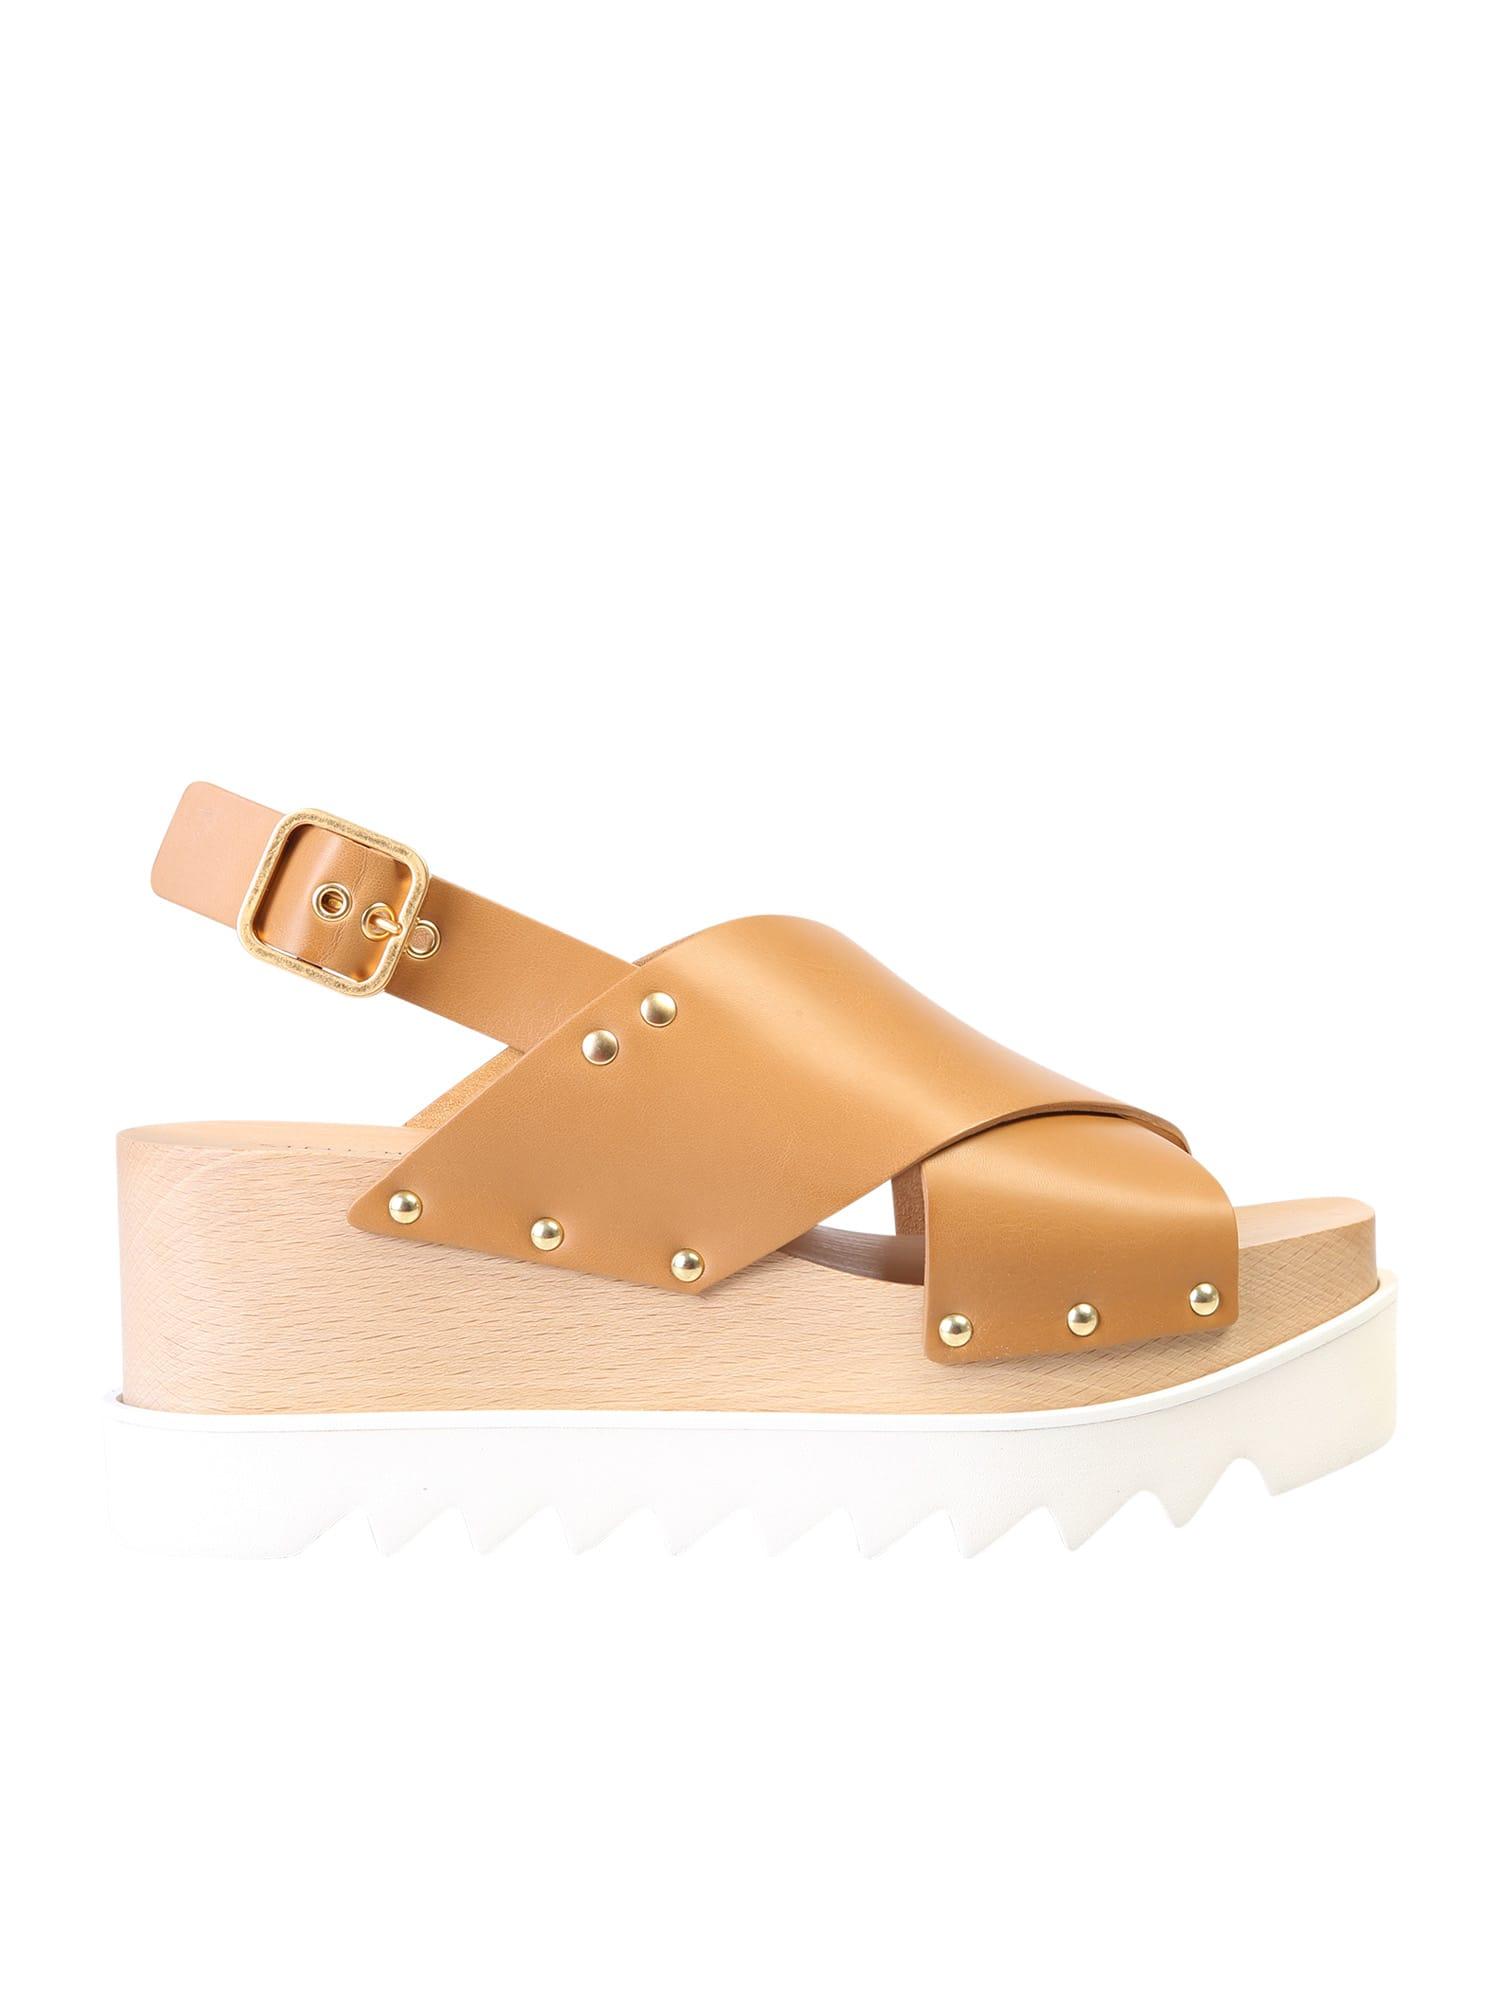 Buy Stella McCartney Elyse Sandals online, shop Stella McCartney shoes with free shipping